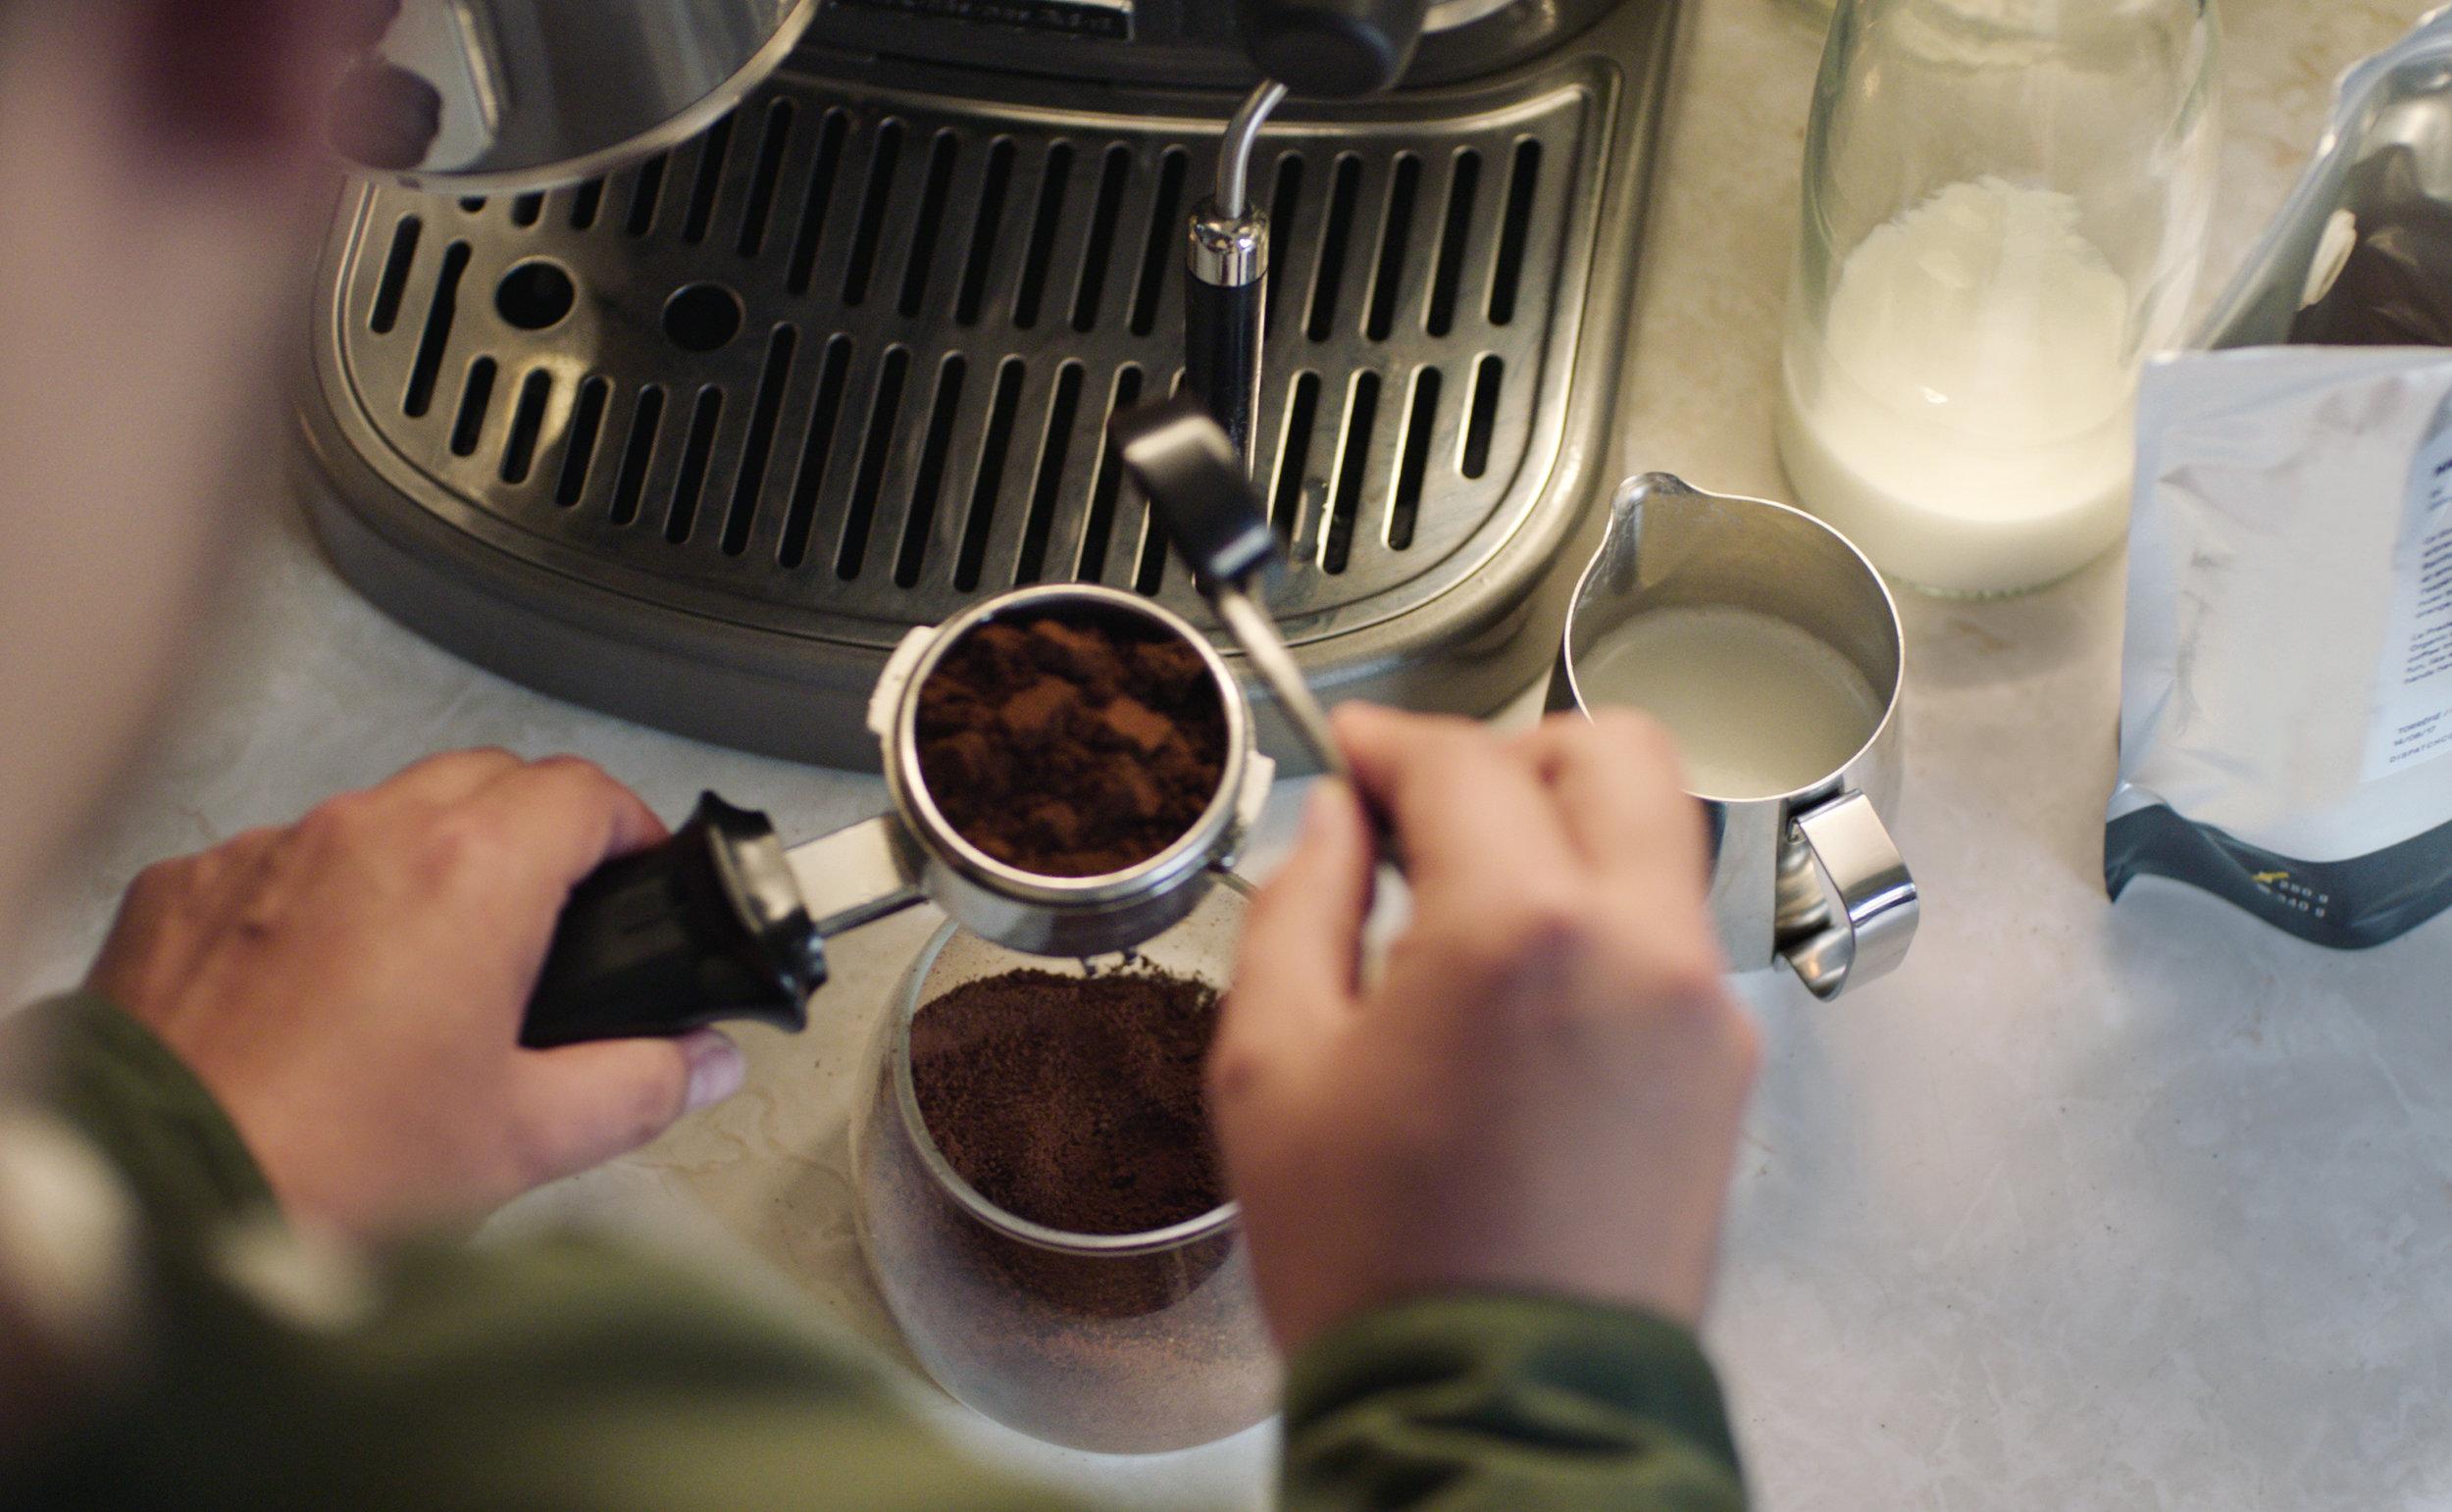 KA_Coffee_Espresso_3.jpg